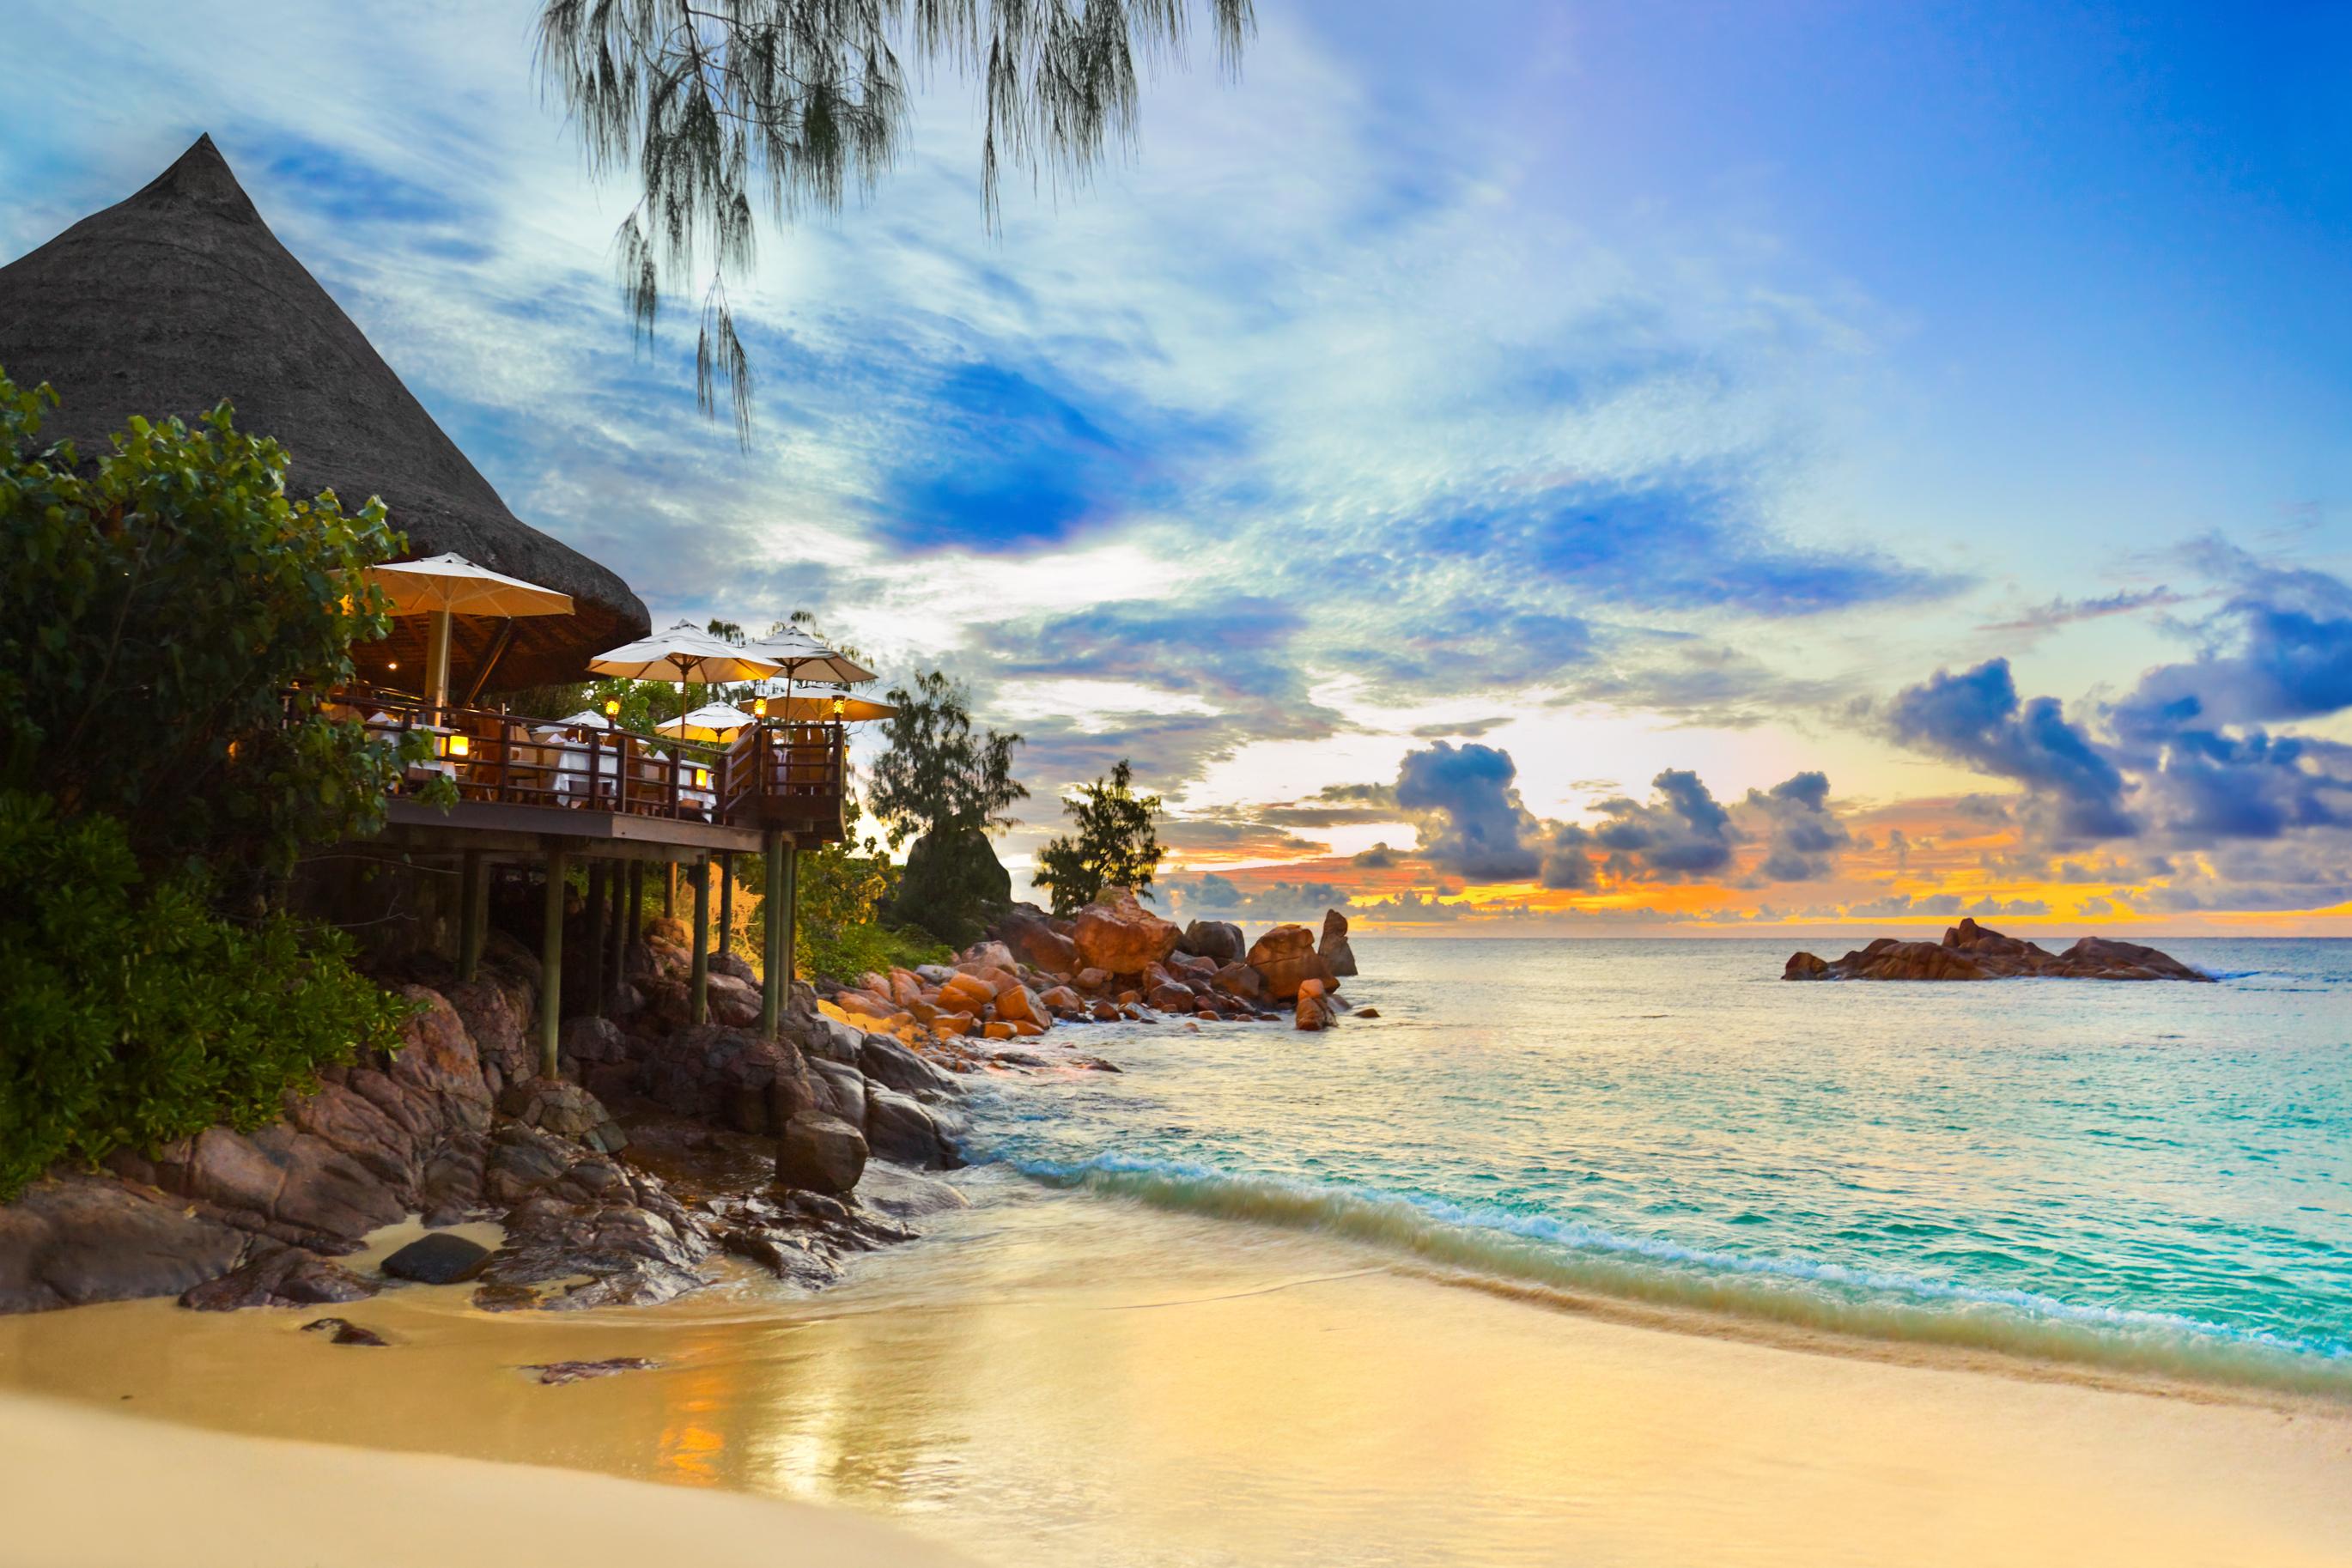 A cafe overlooking a tropical beach